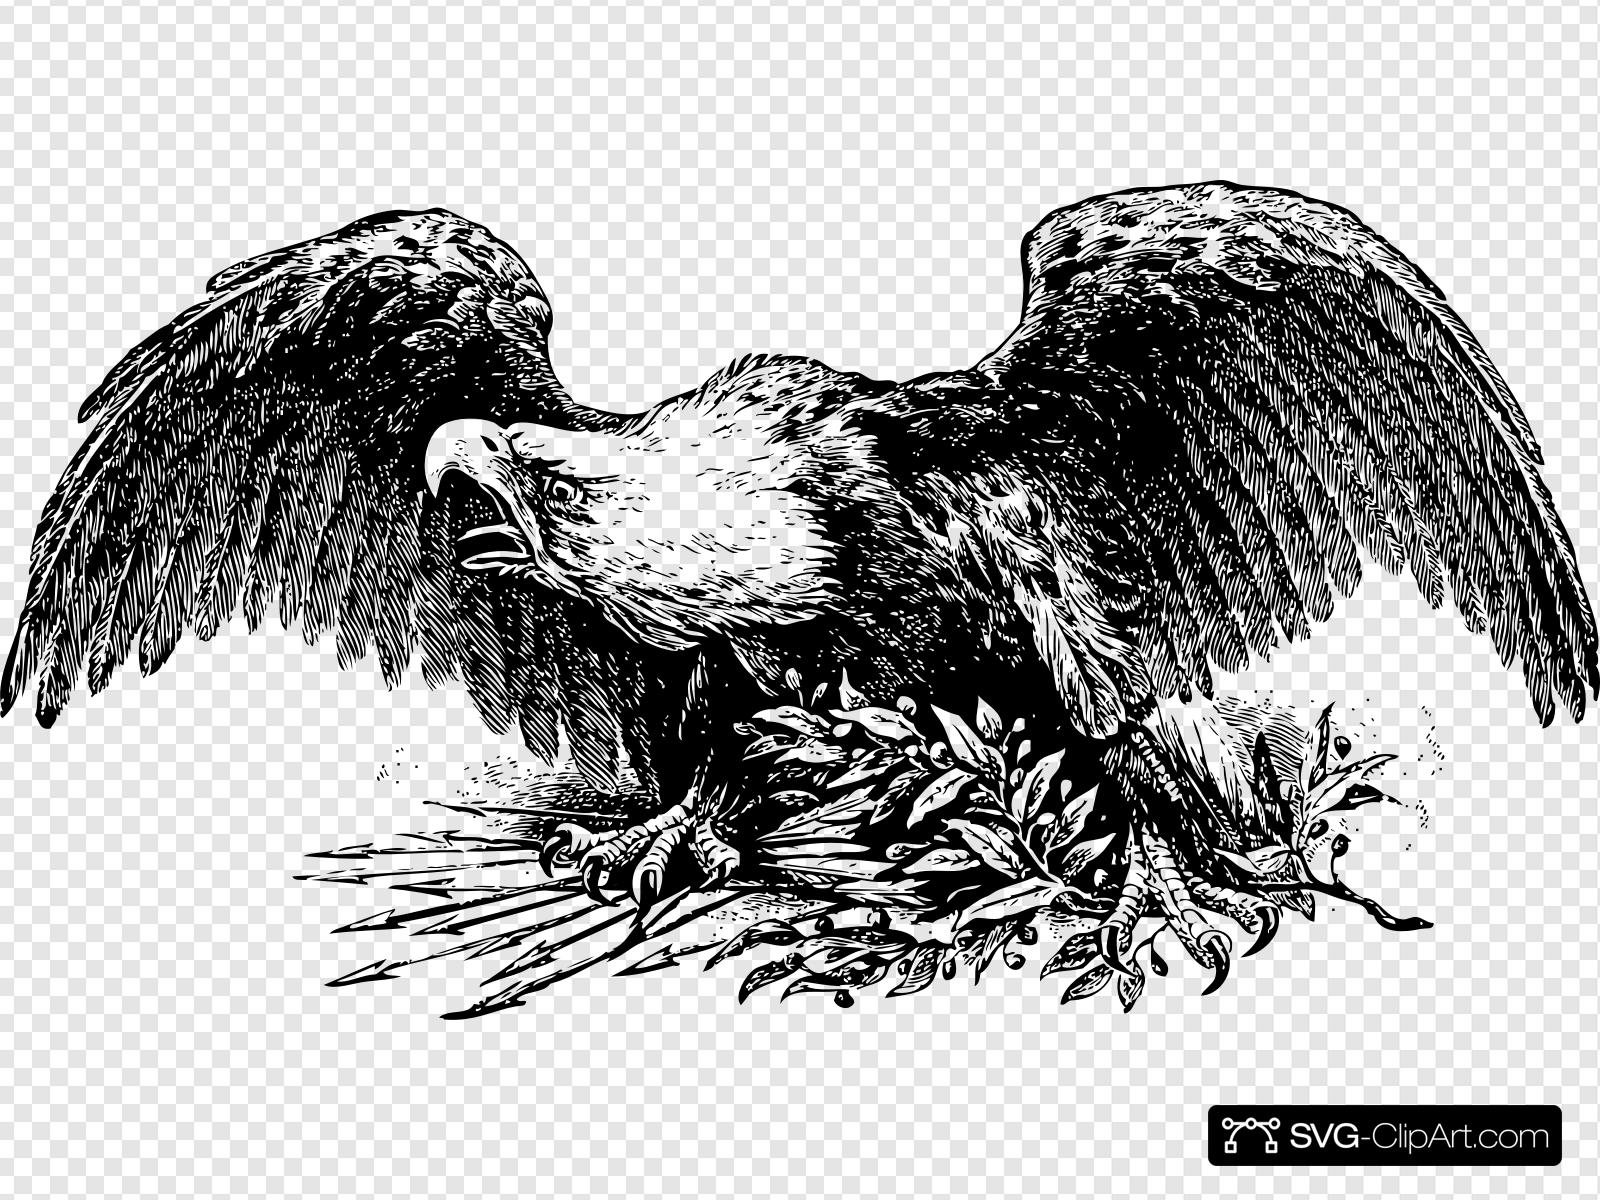 War Eagle Clip art, Icon and SVG.